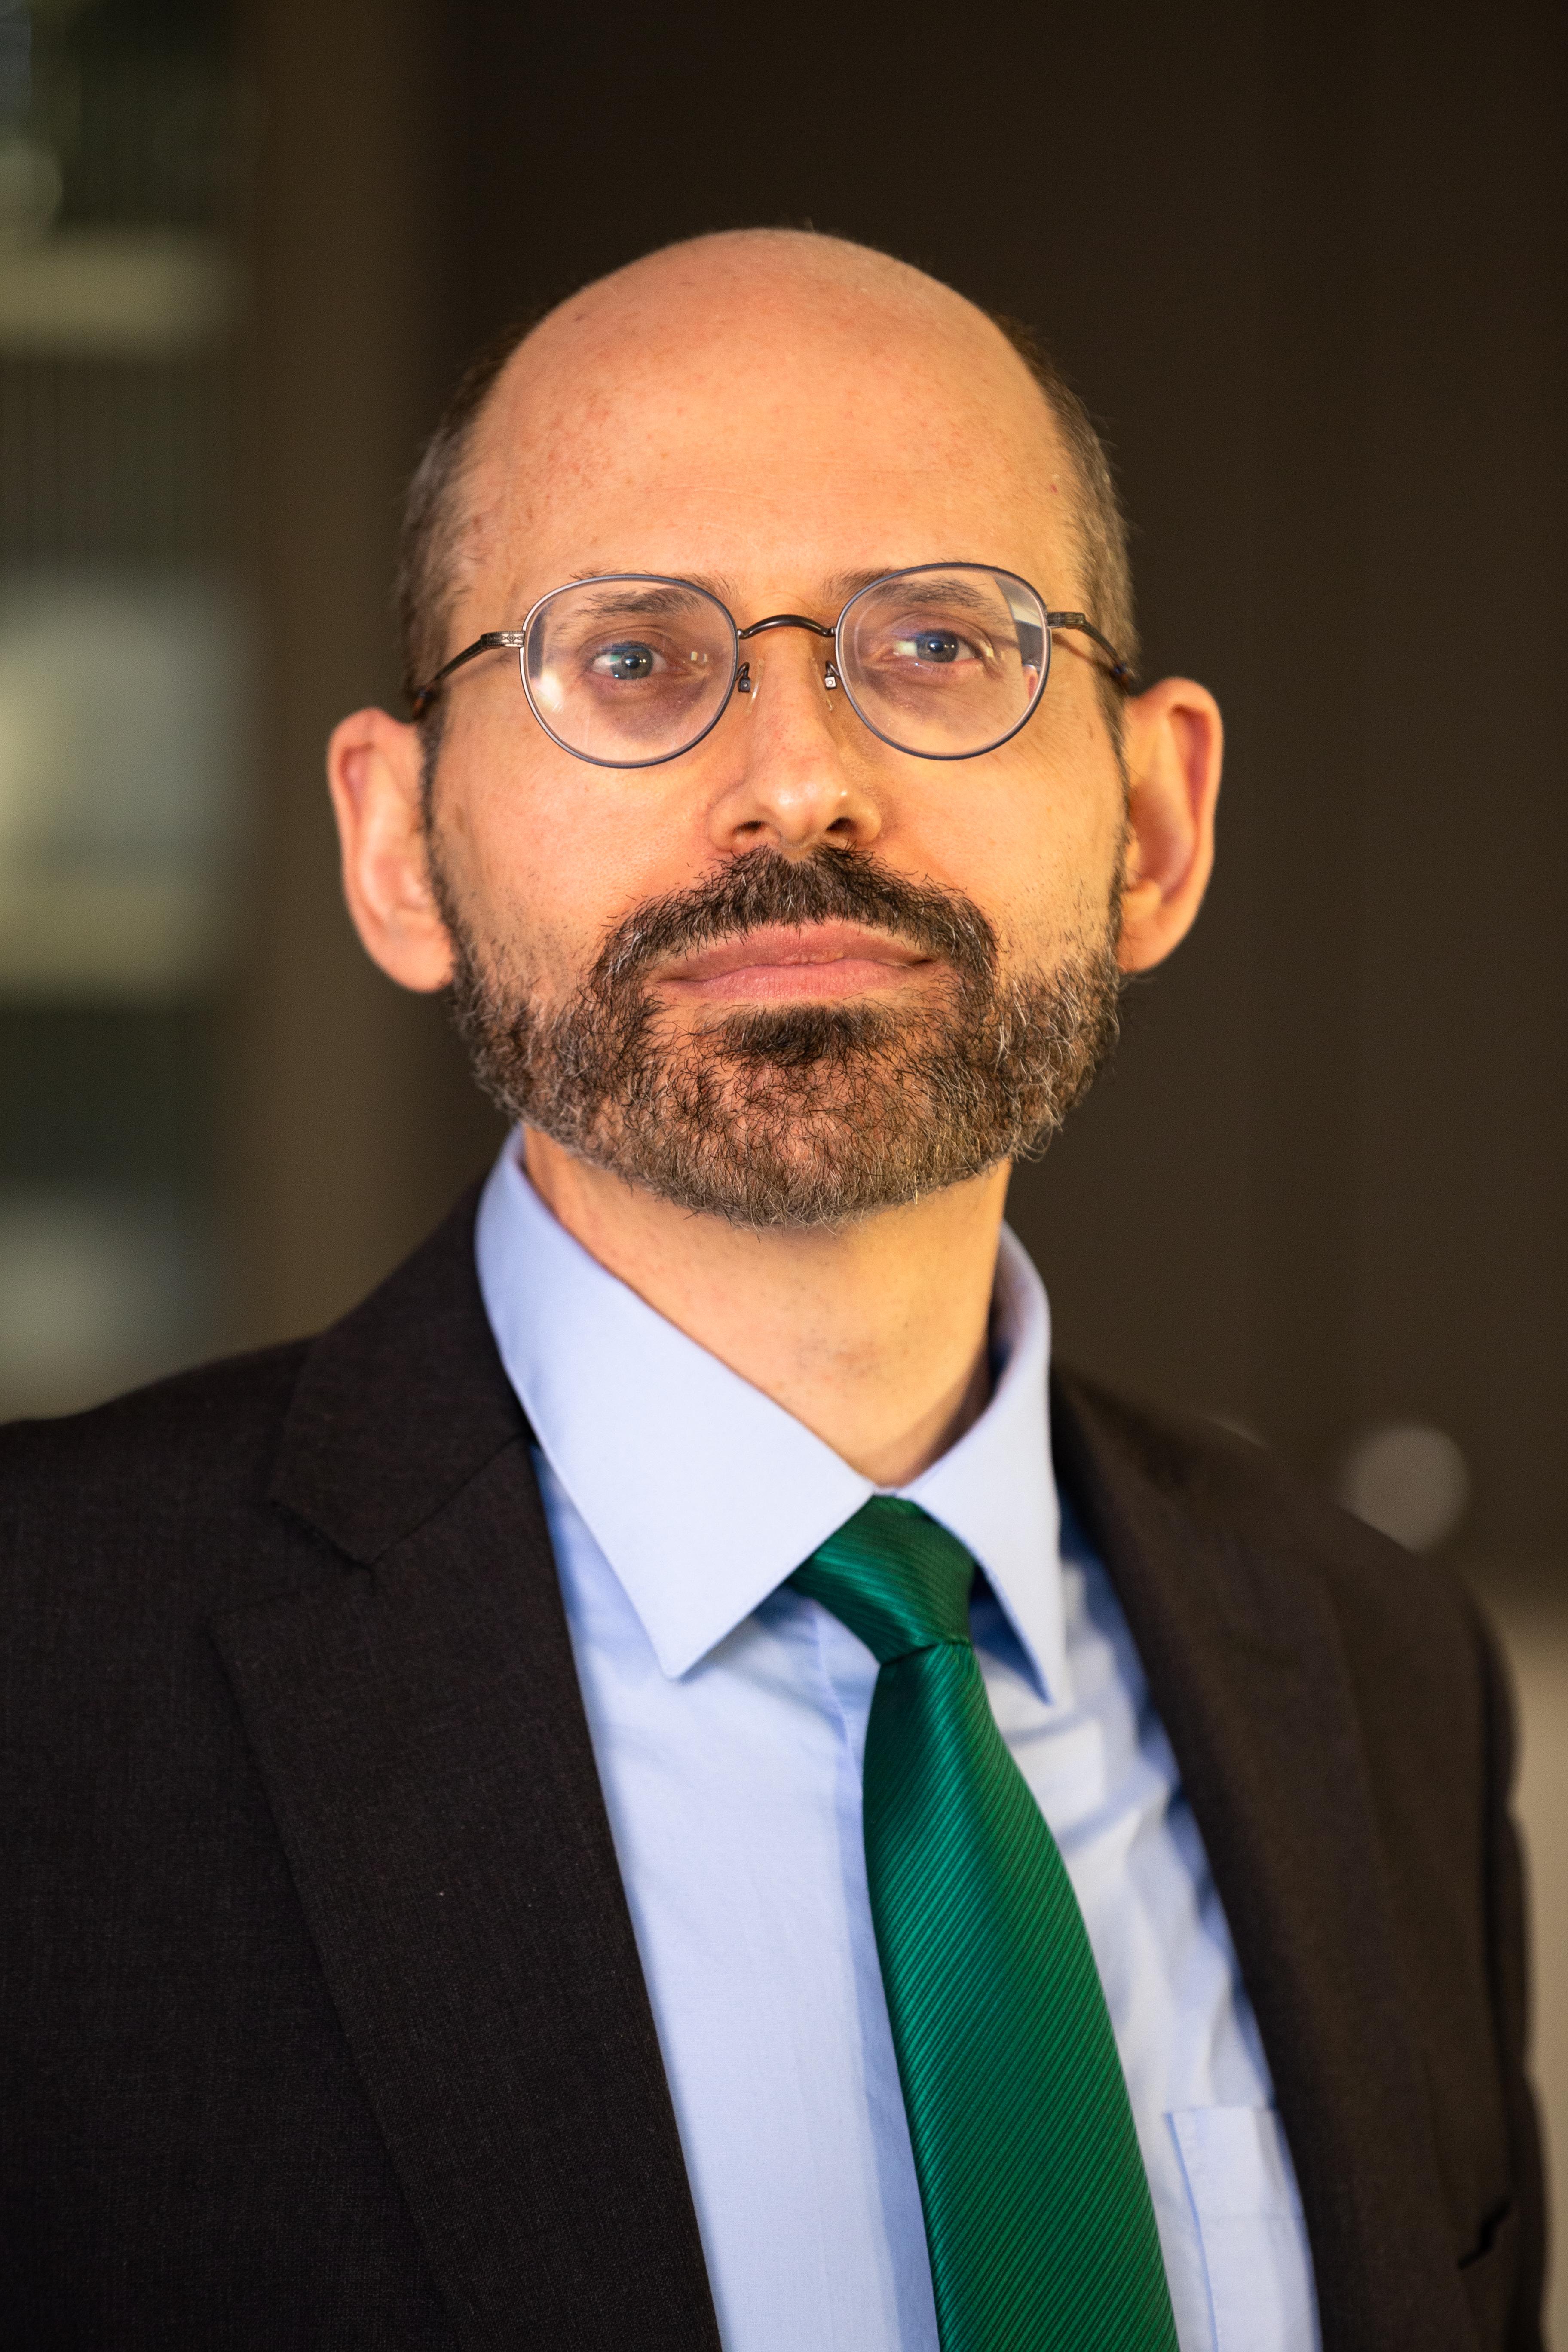 Dr. Greger Headshot